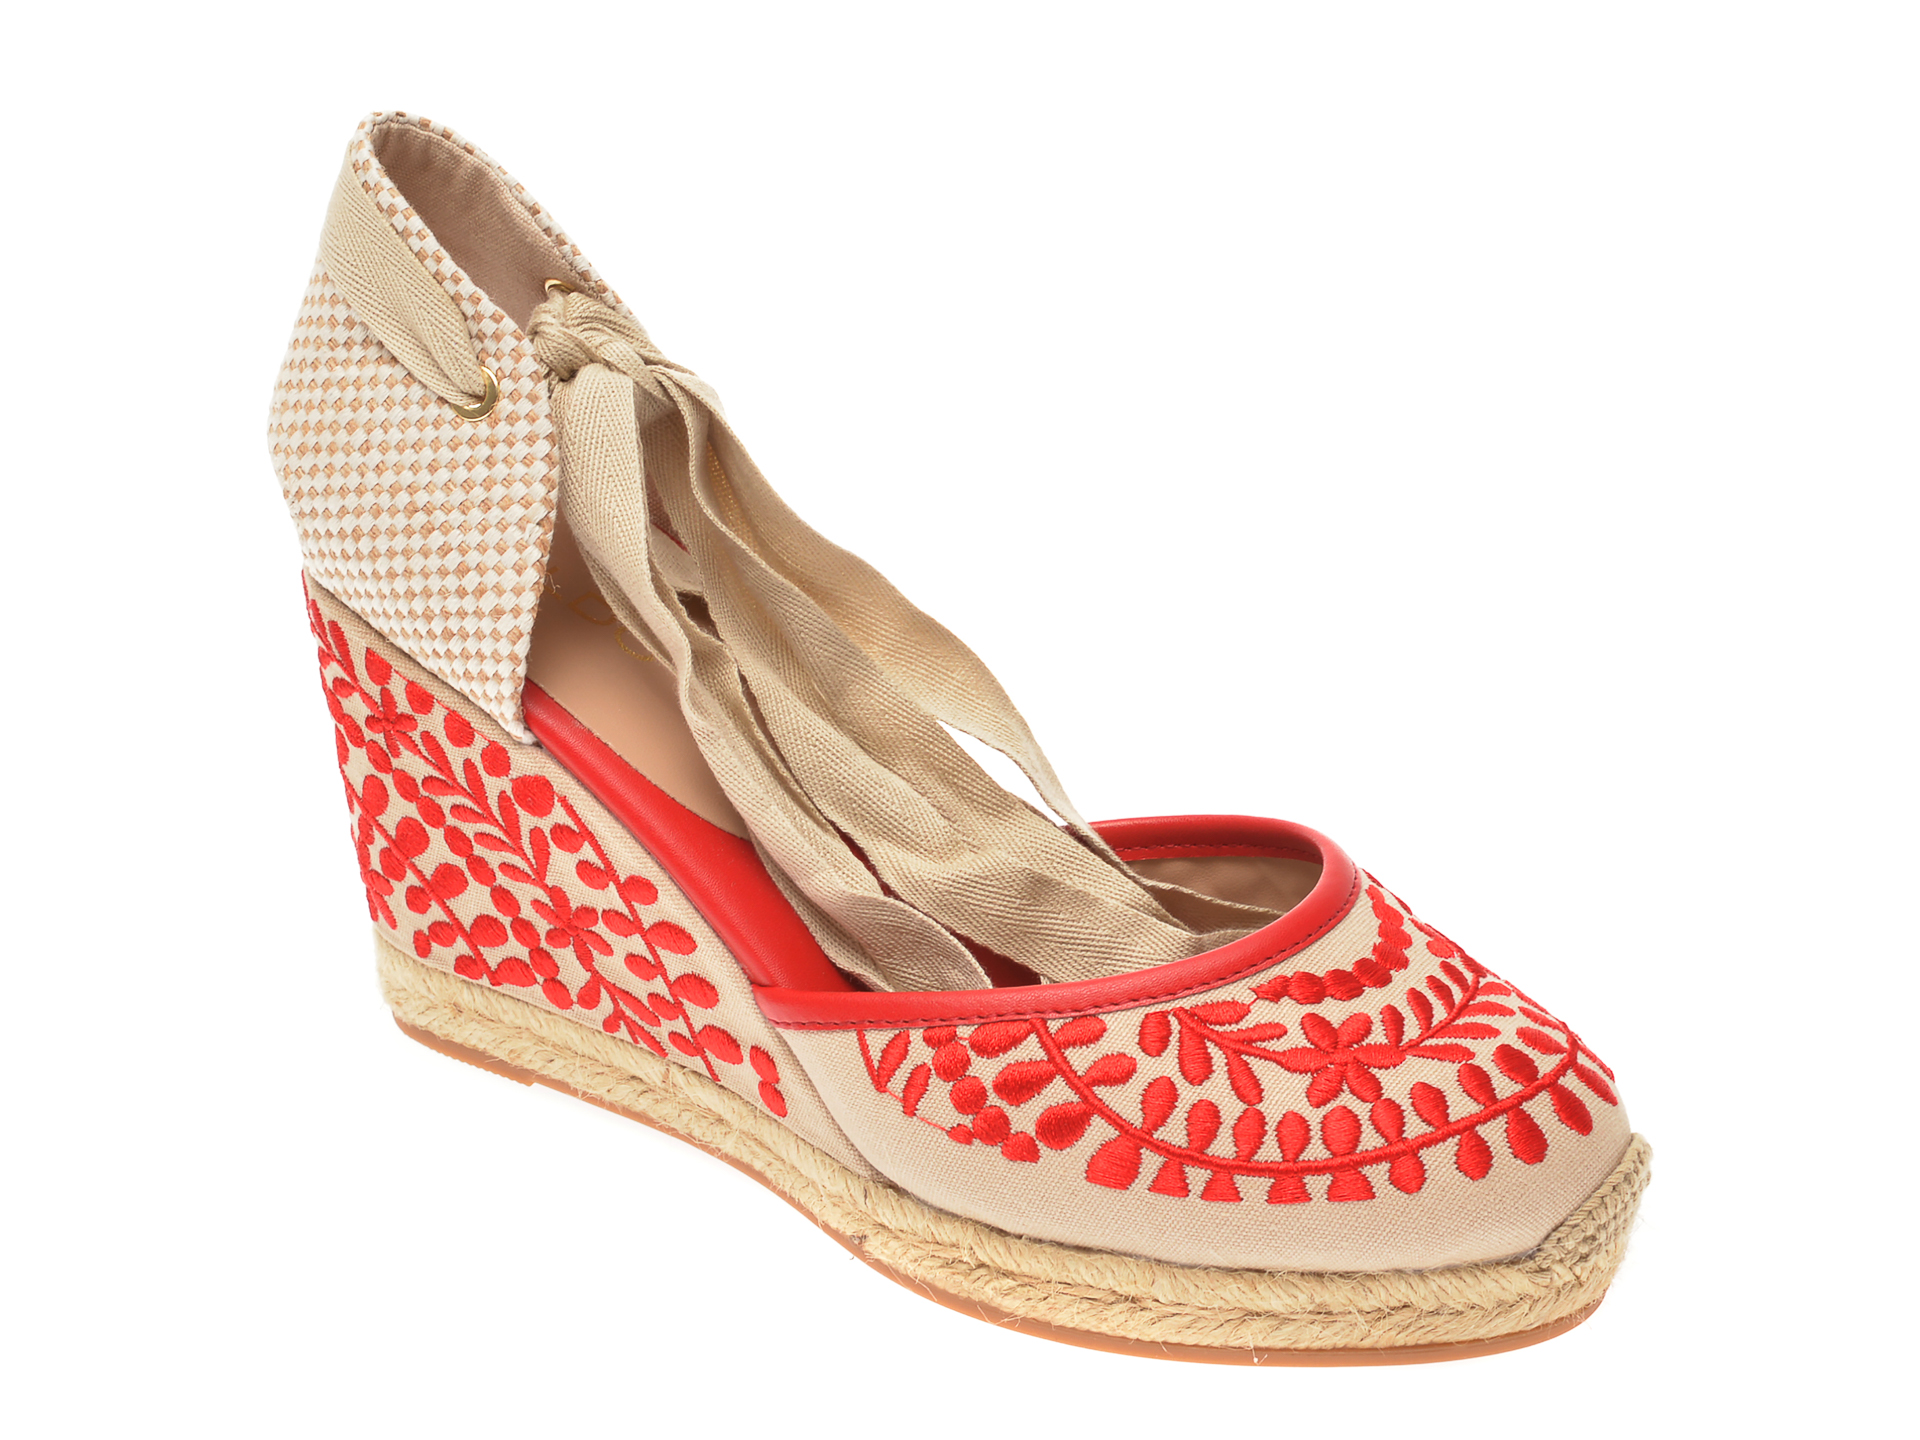 Pantofi ALDO rosii, Muschino600, din material textil imagine otter.ro